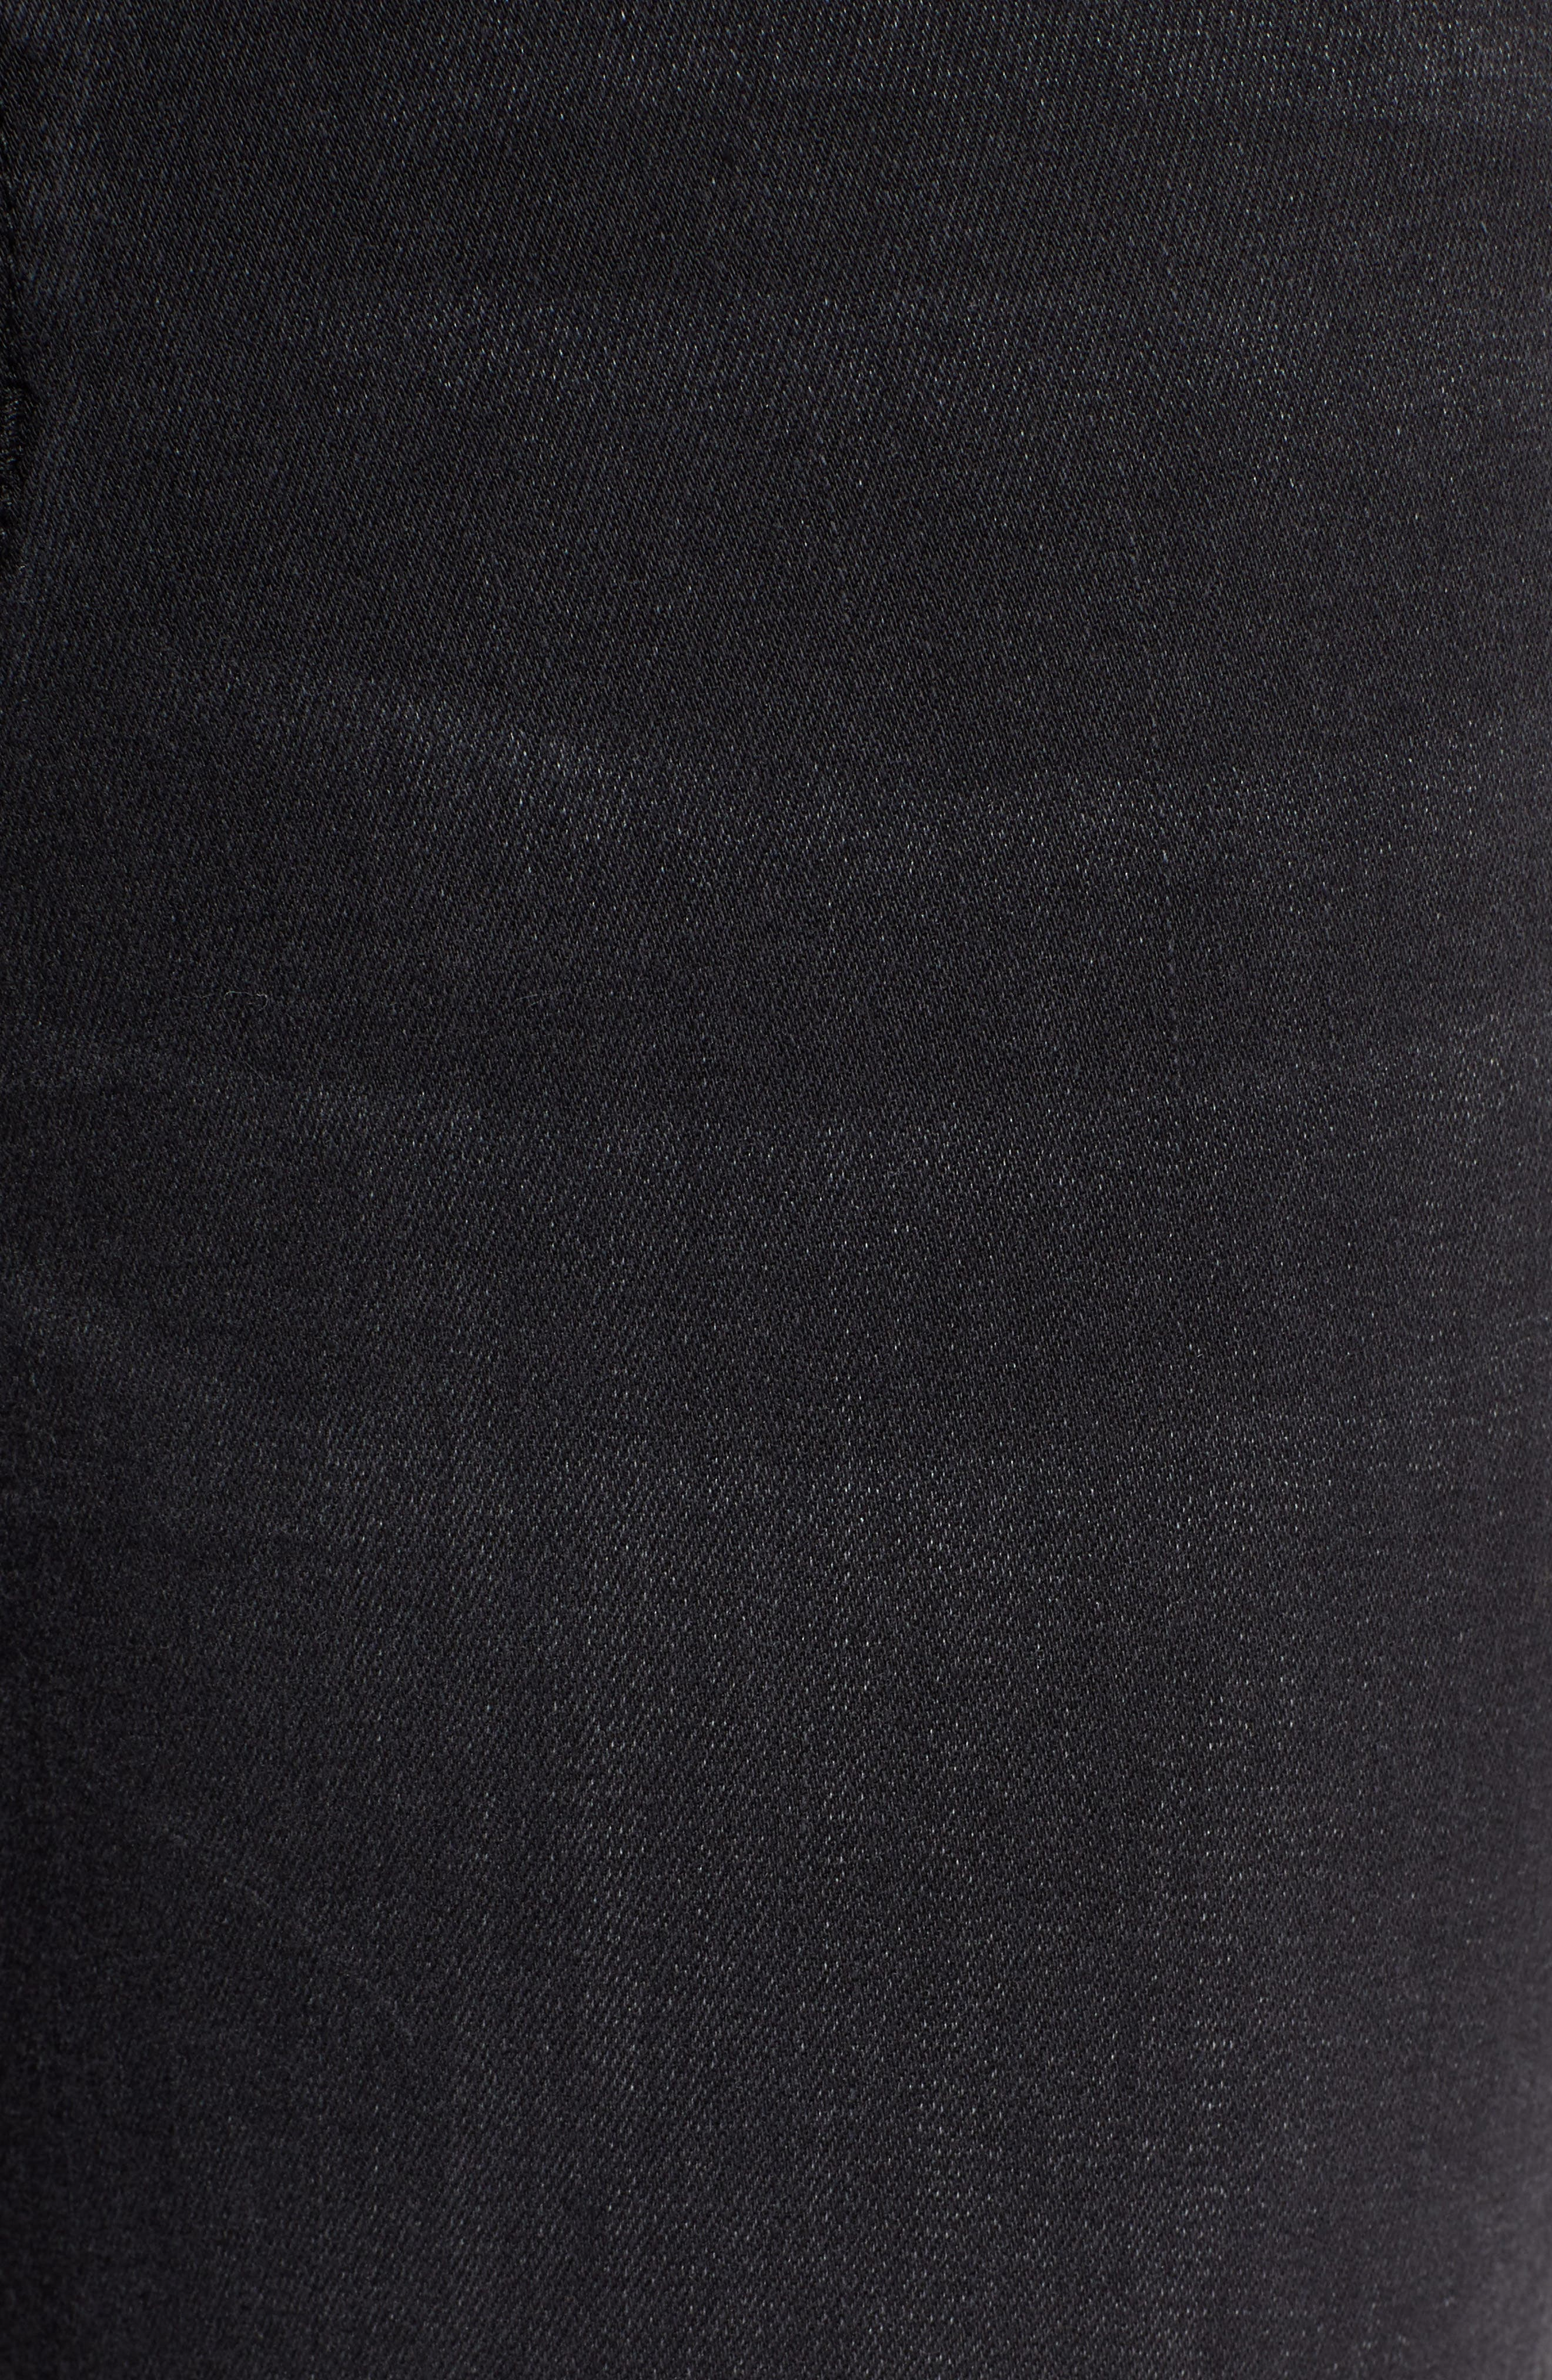 Crop Flare Jeans,                             Alternate thumbnail 5, color,                             BLACK